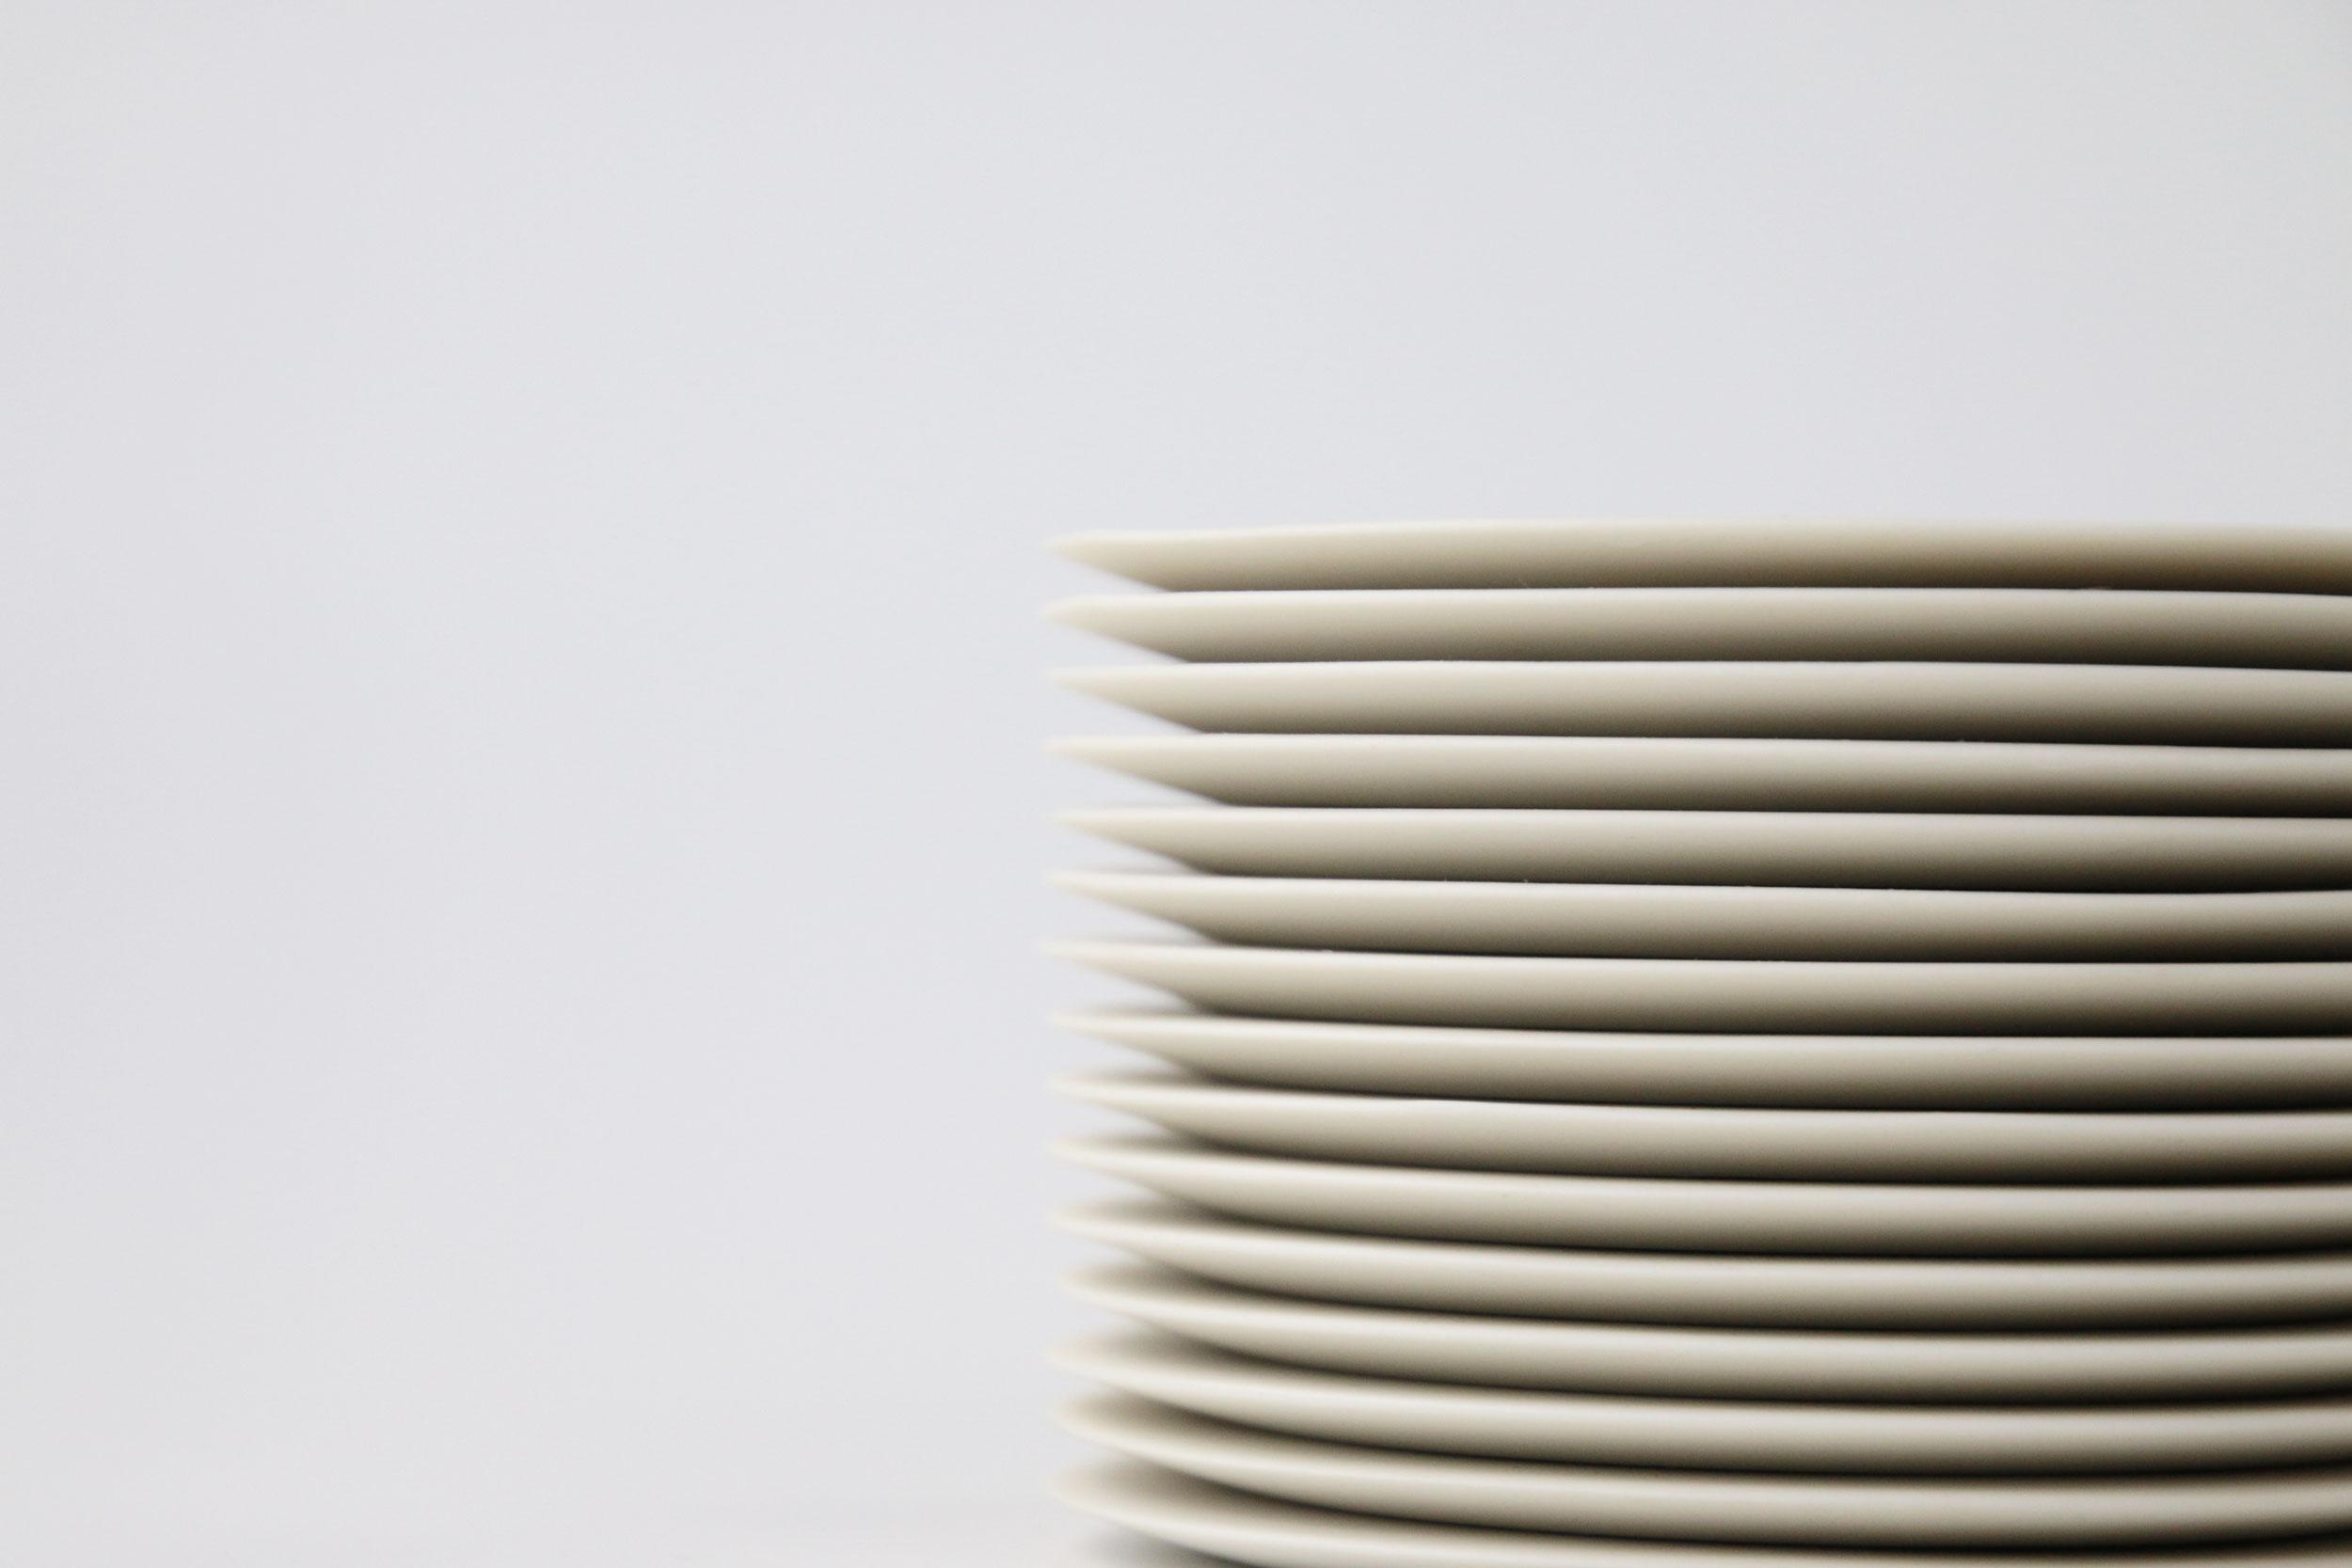 Plate_R_5.jpg